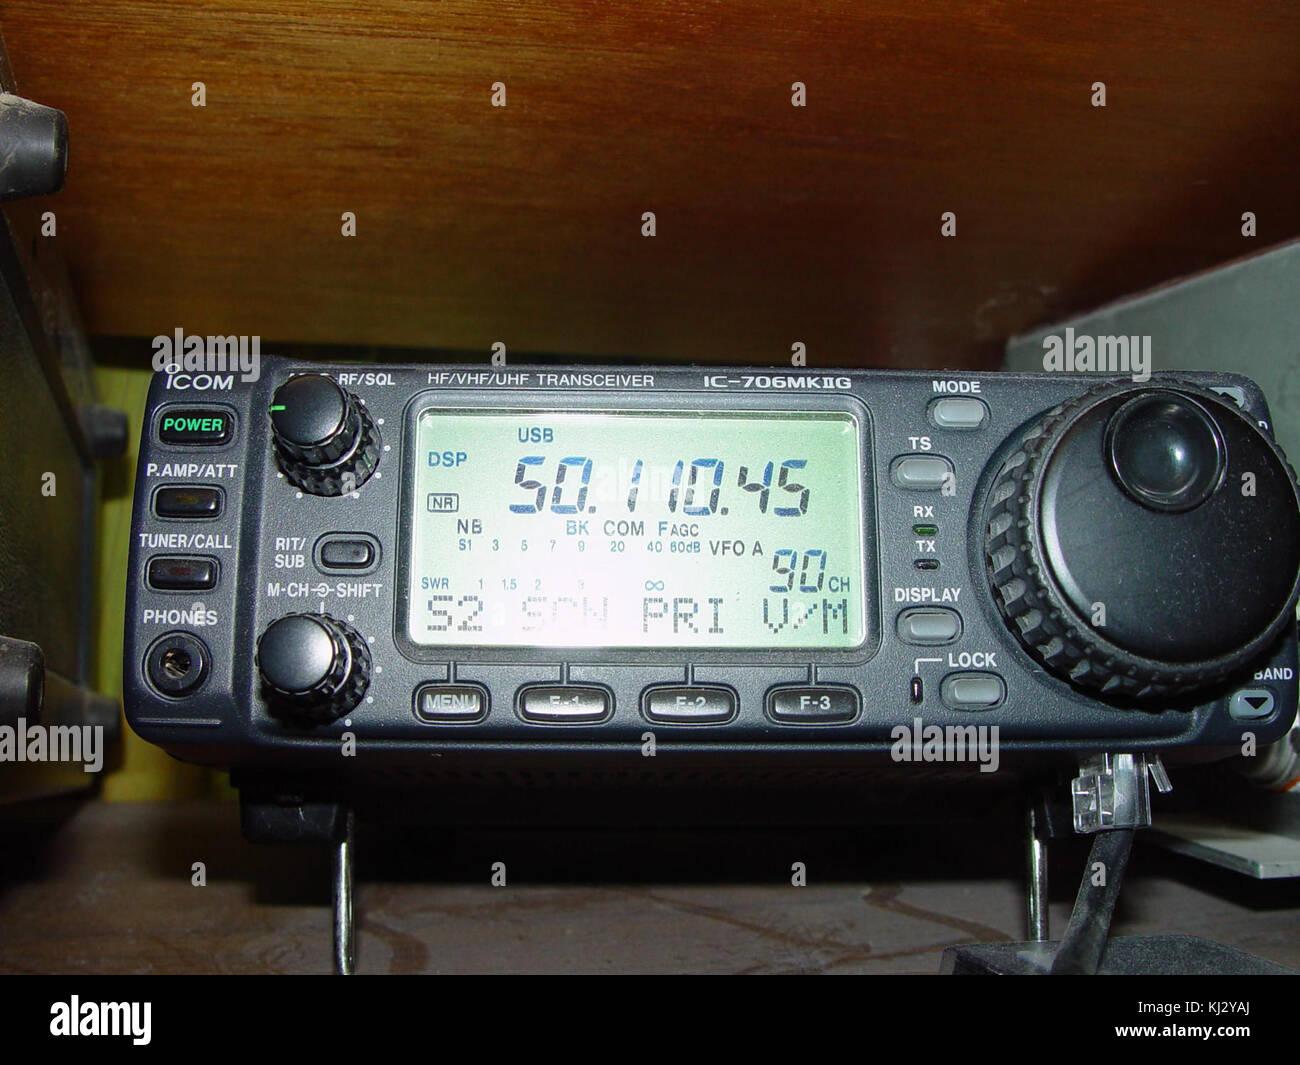 Icom ic 706mk8g hf vhf uhf trans receiver Stock Photo